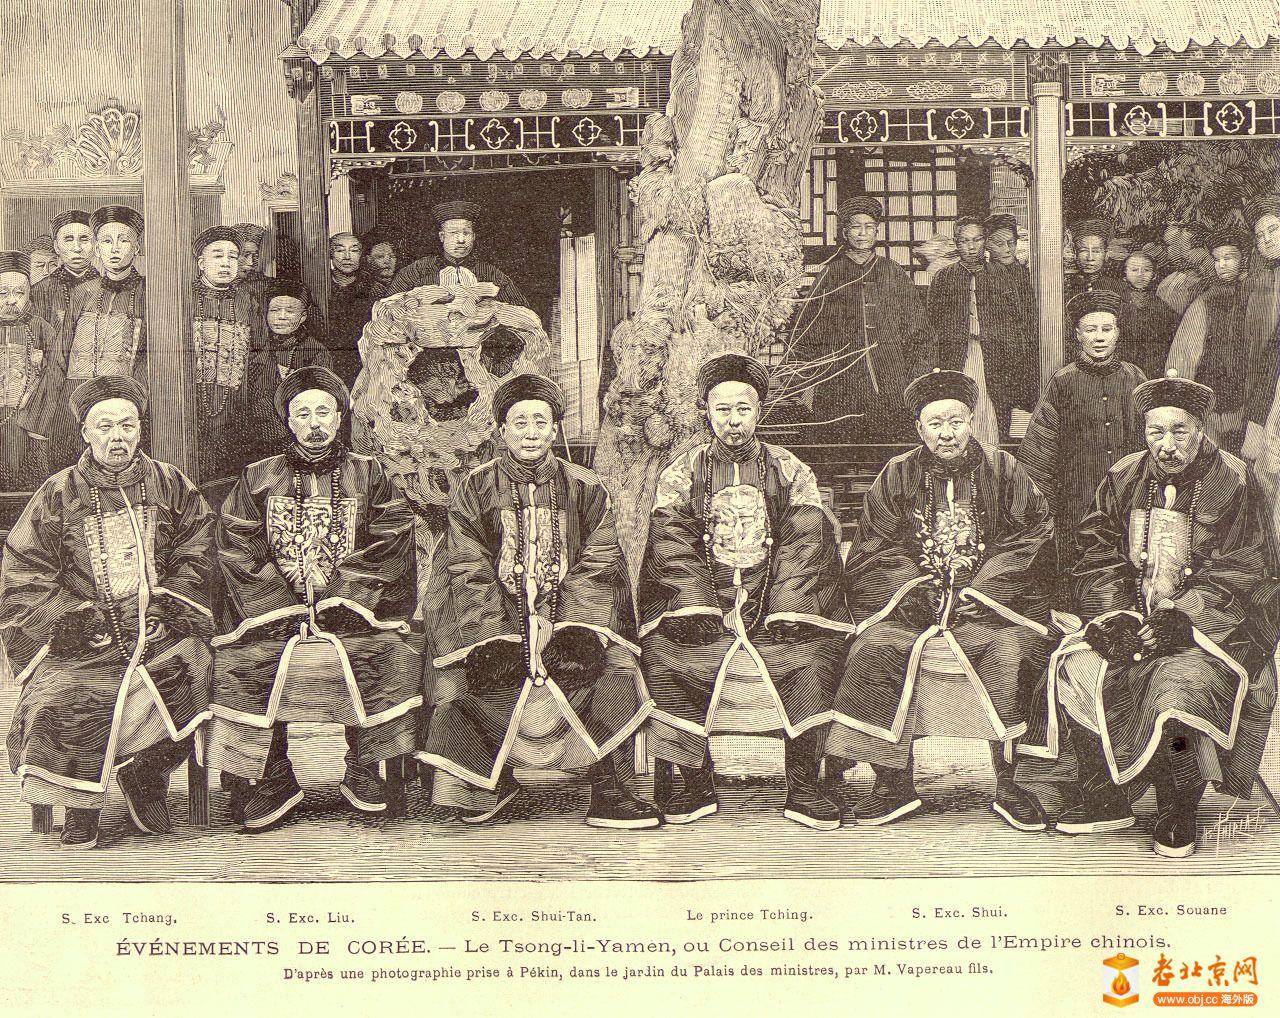 zongli_yamen_members_1894_original.jpg